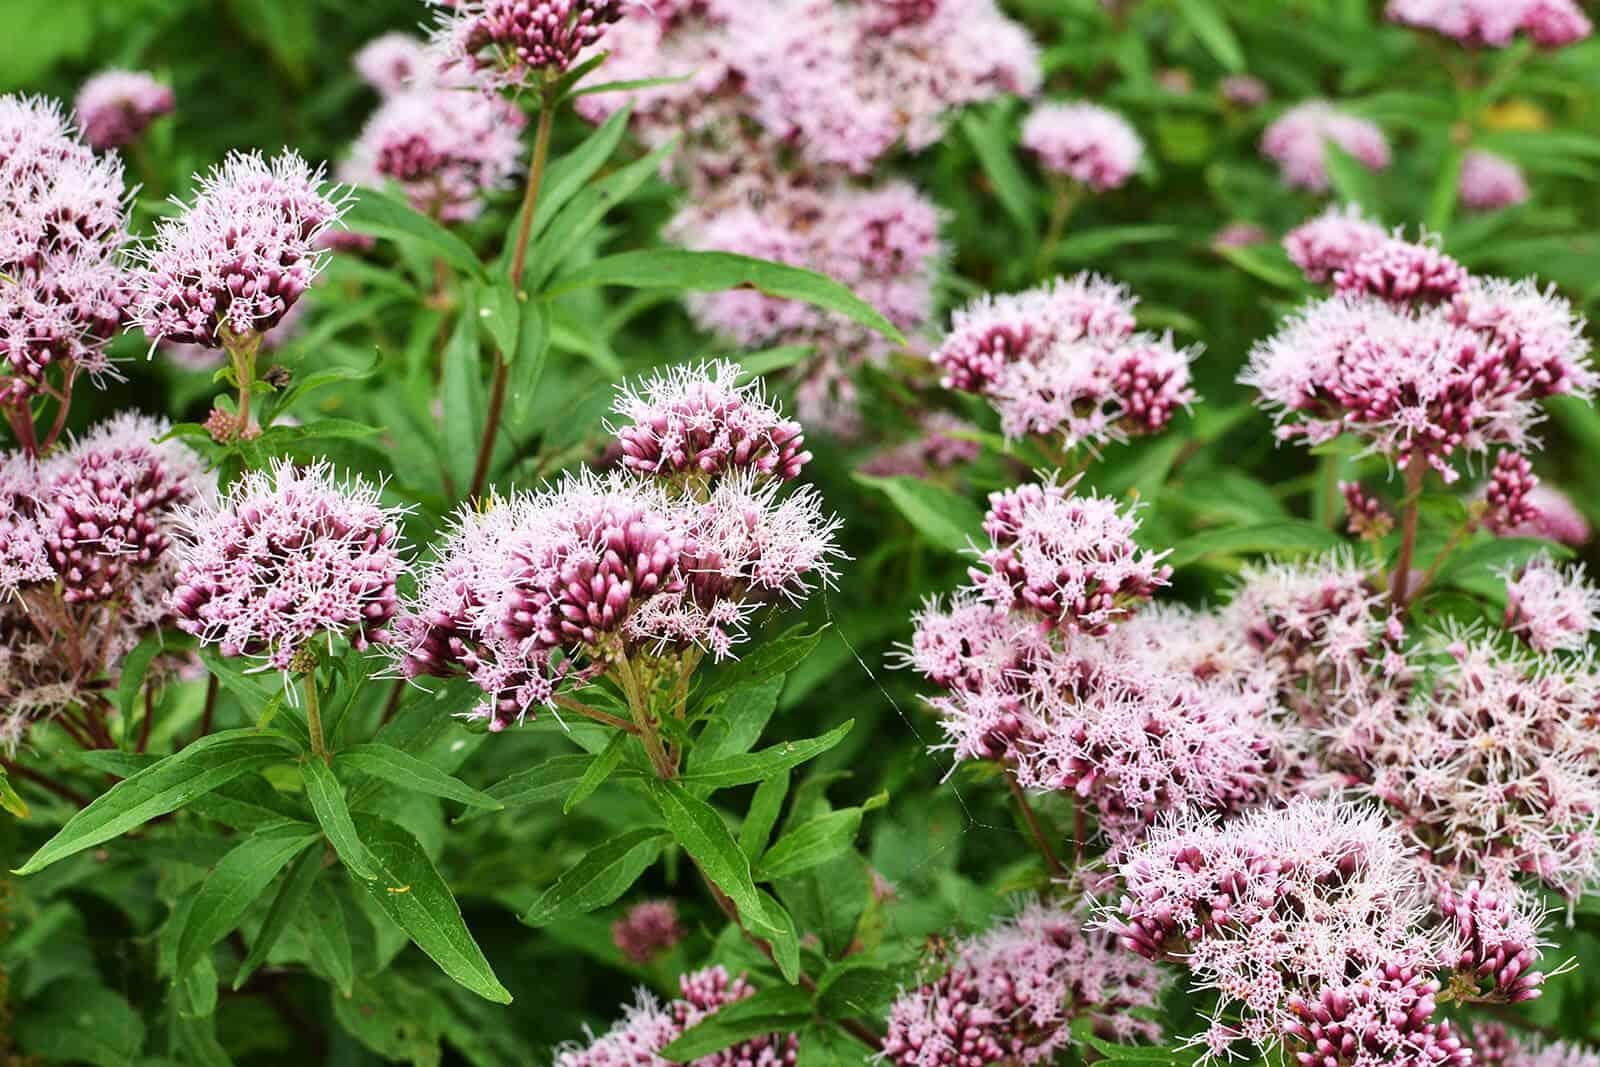 wellnessaromas-aromatherapy-essential-oil_valerian-benefits-uses